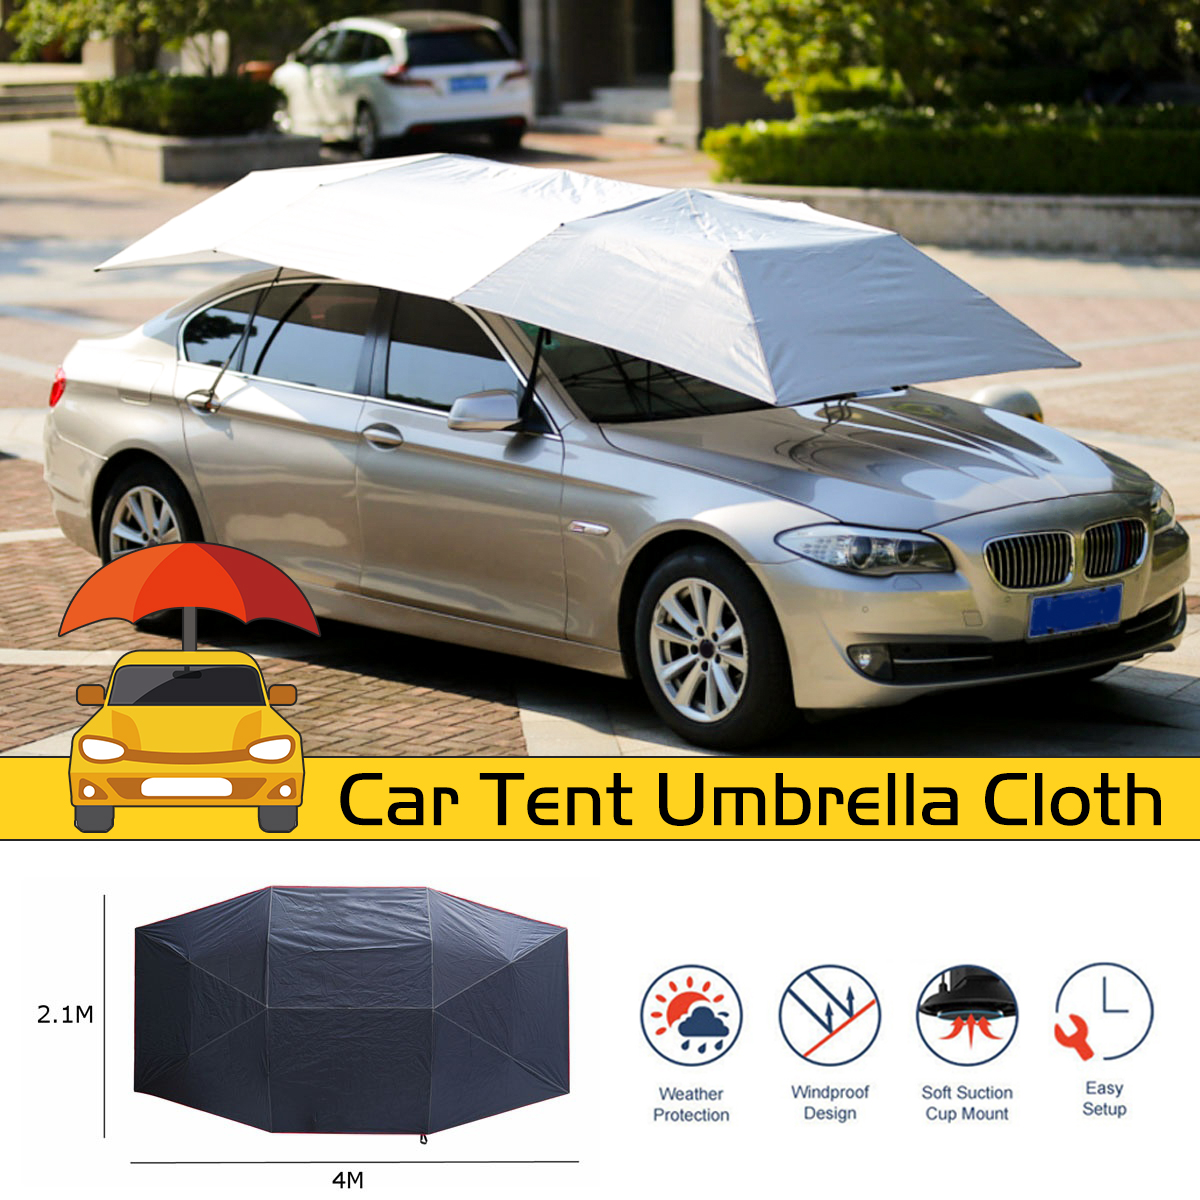 Waterproof Anti UV Full Automatic Outdoor Car Vehicle Tent Umbrella Sunshade Roof Cover Car Umbrella Sun Shade Cloth Replaceable